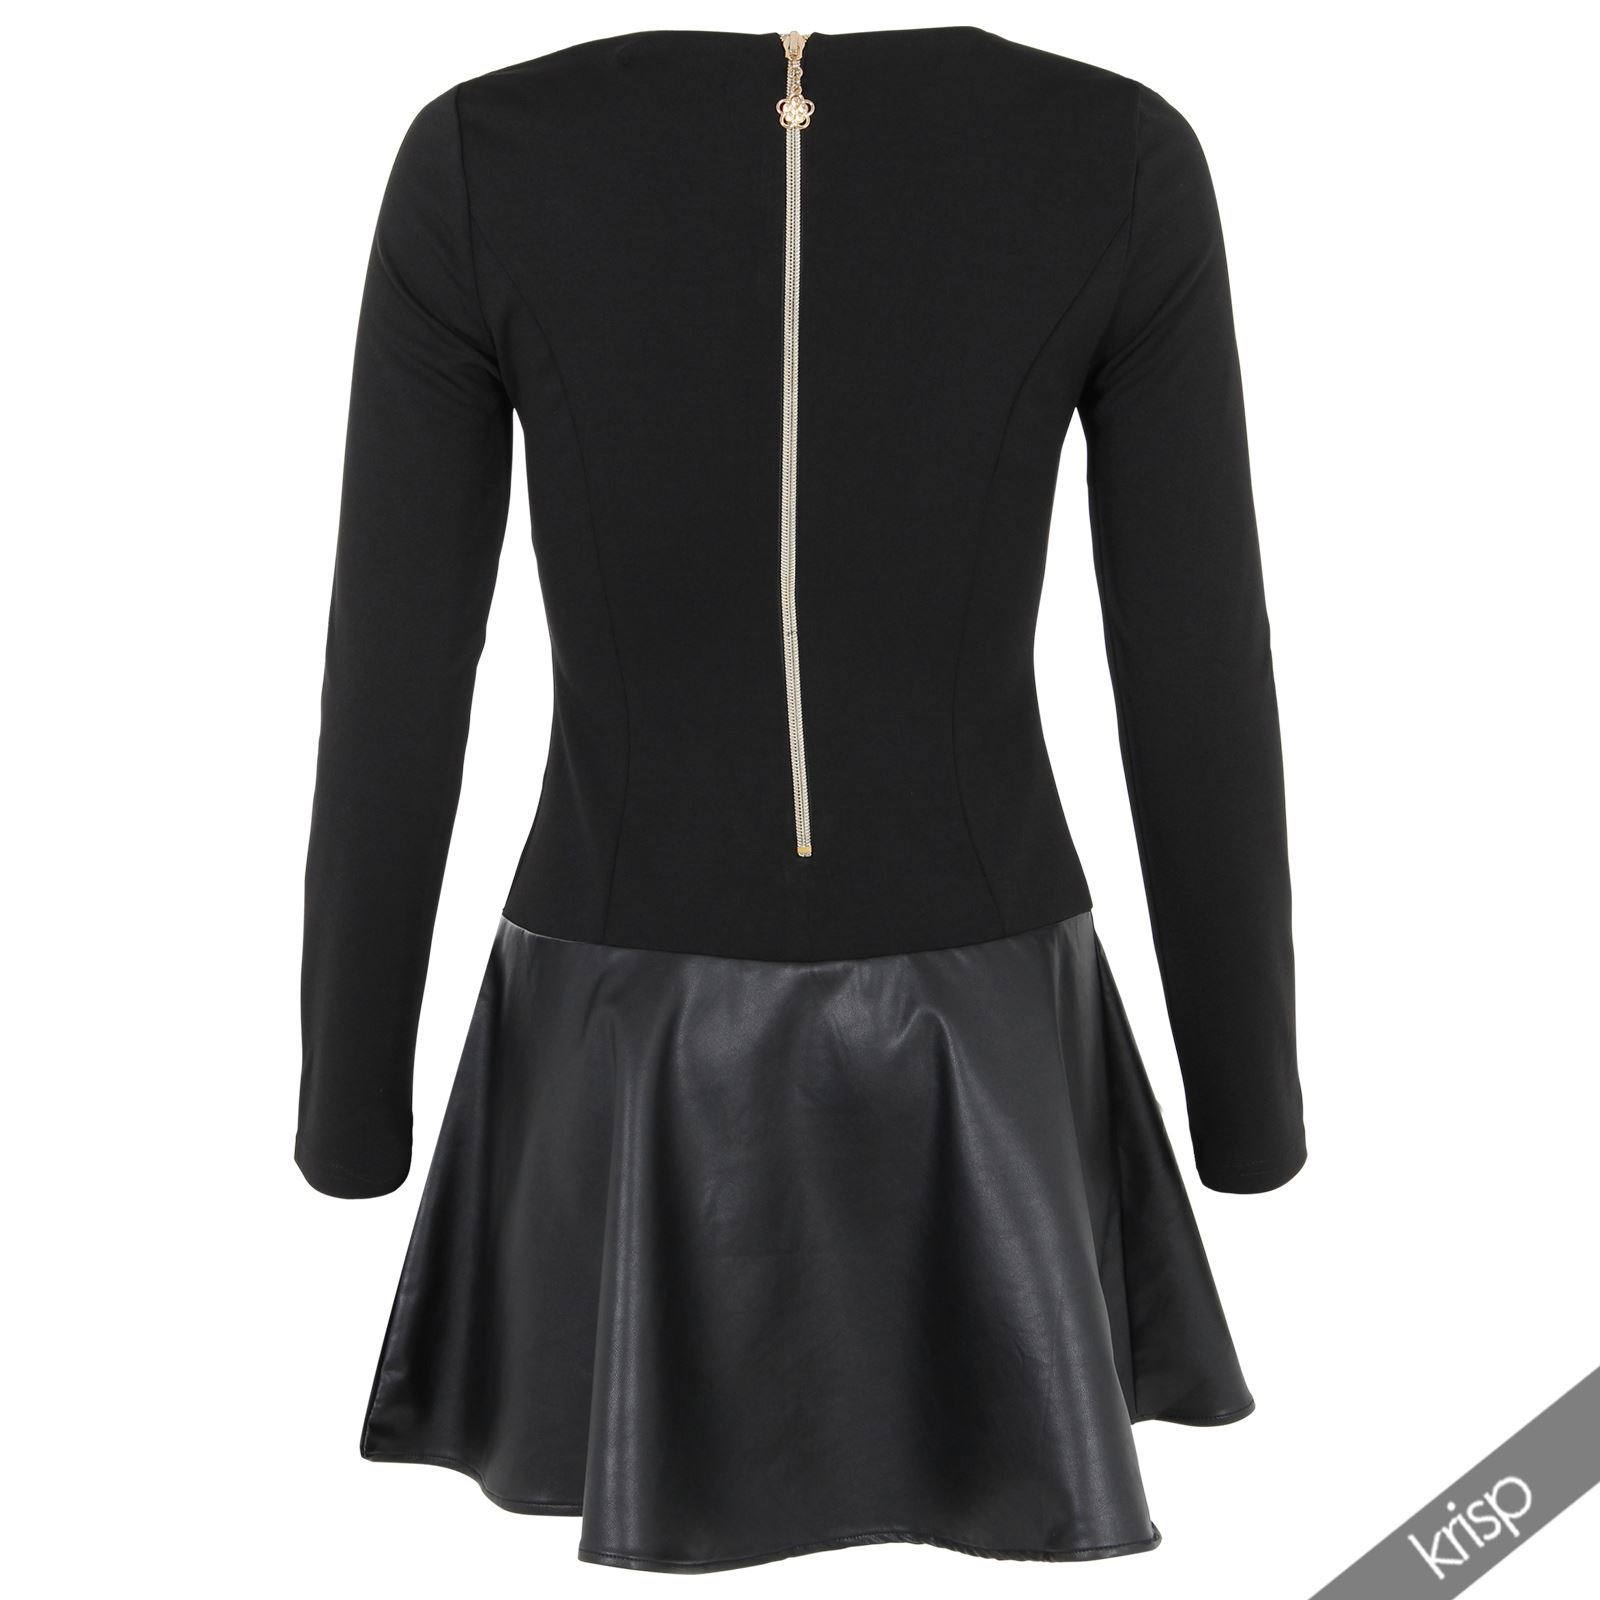 krisp damen kurzes kleid langarm leder stoff skater kleid top mini lederkleid ebay. Black Bedroom Furniture Sets. Home Design Ideas